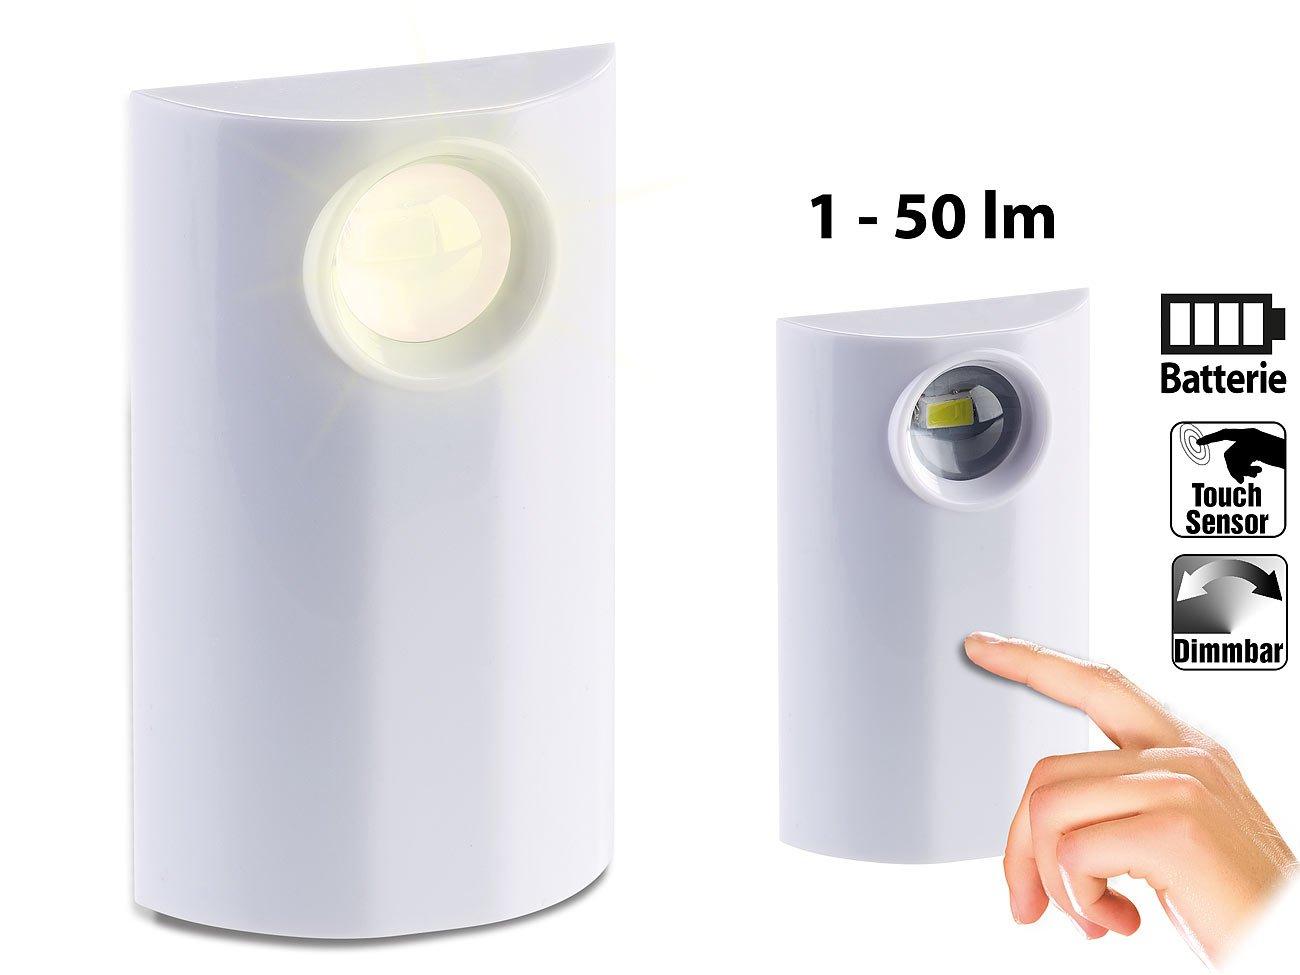 PEARL LED Lampe Batterie: Helle LED-Lampe mit Batteriebetrieb, Touch ...